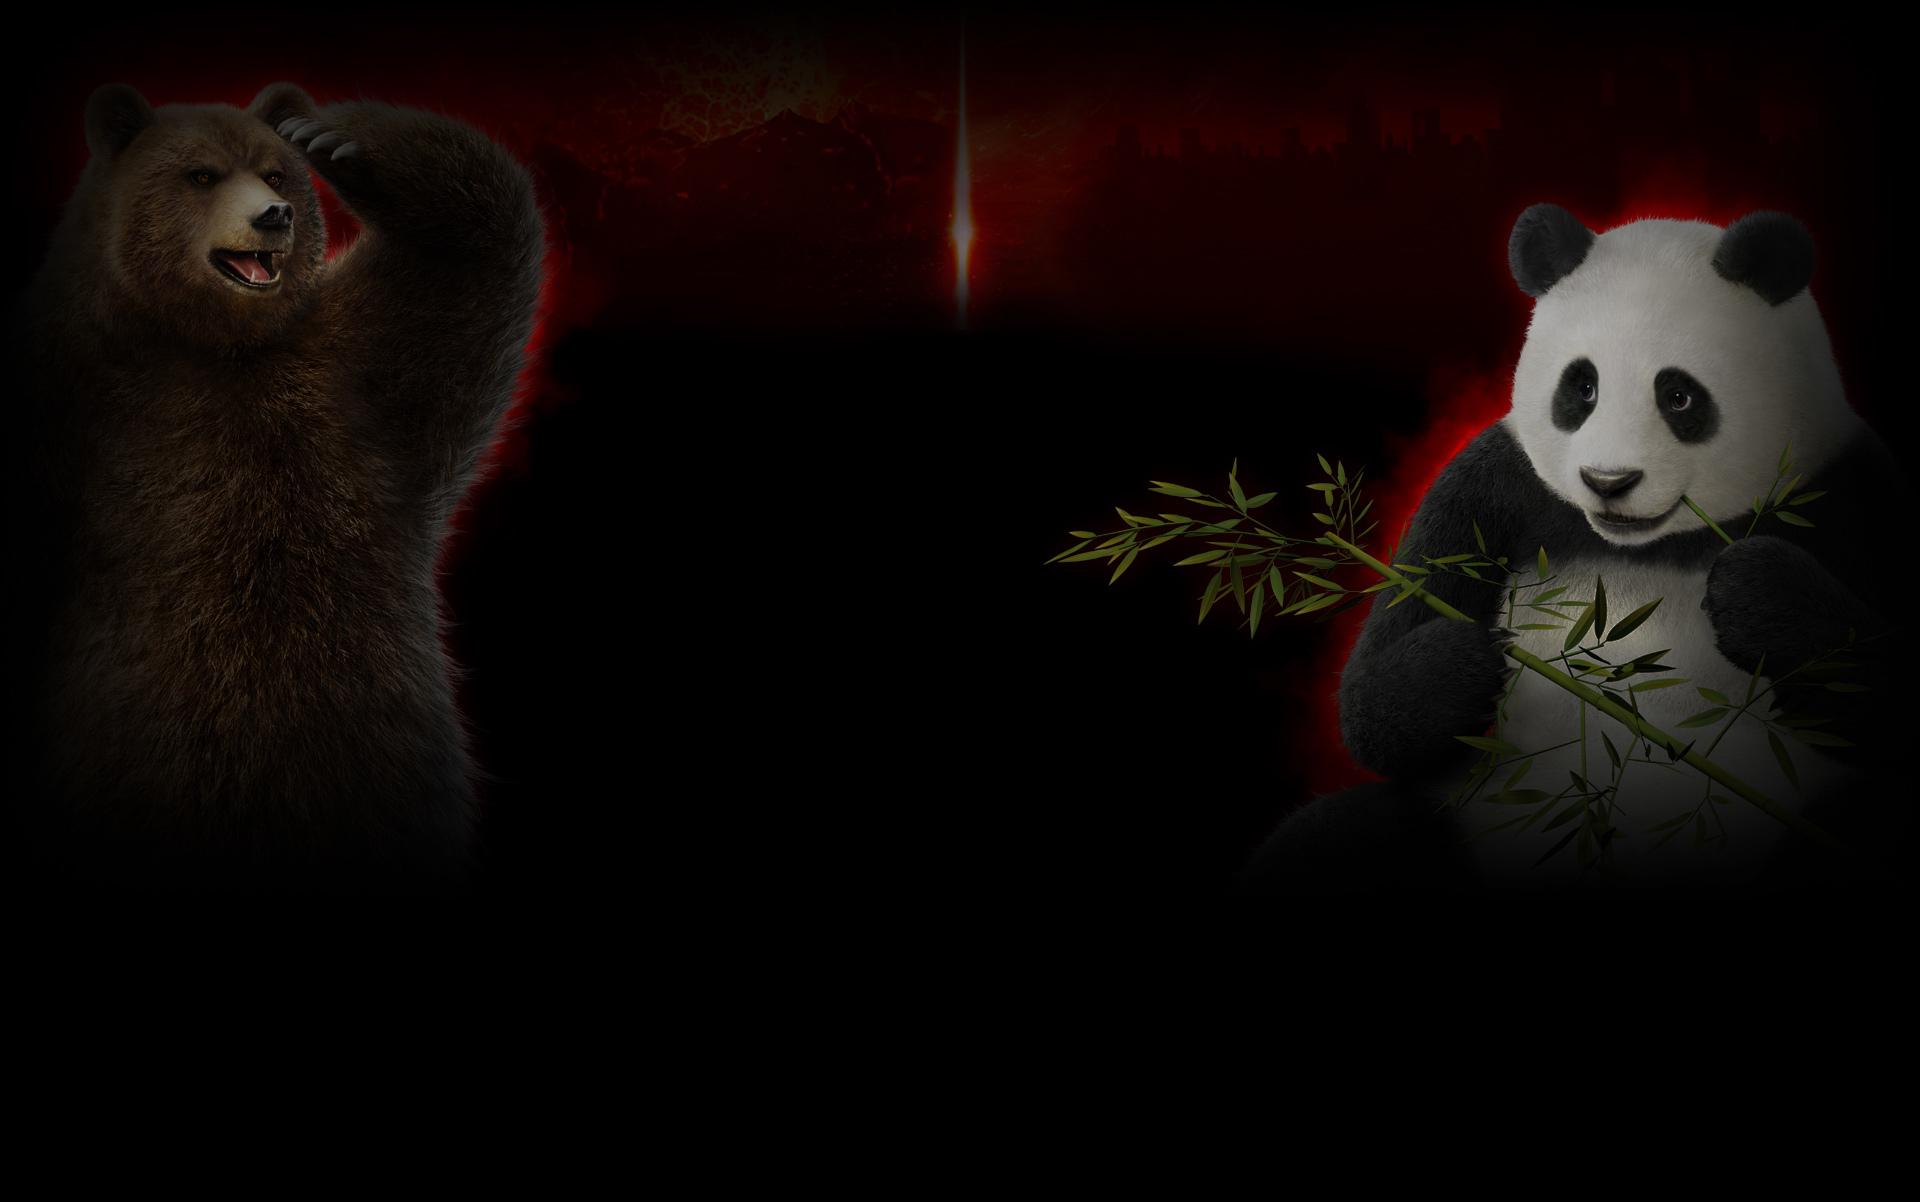 Tekken 7 HD Wallpaper Background Image 1920x1202 ID